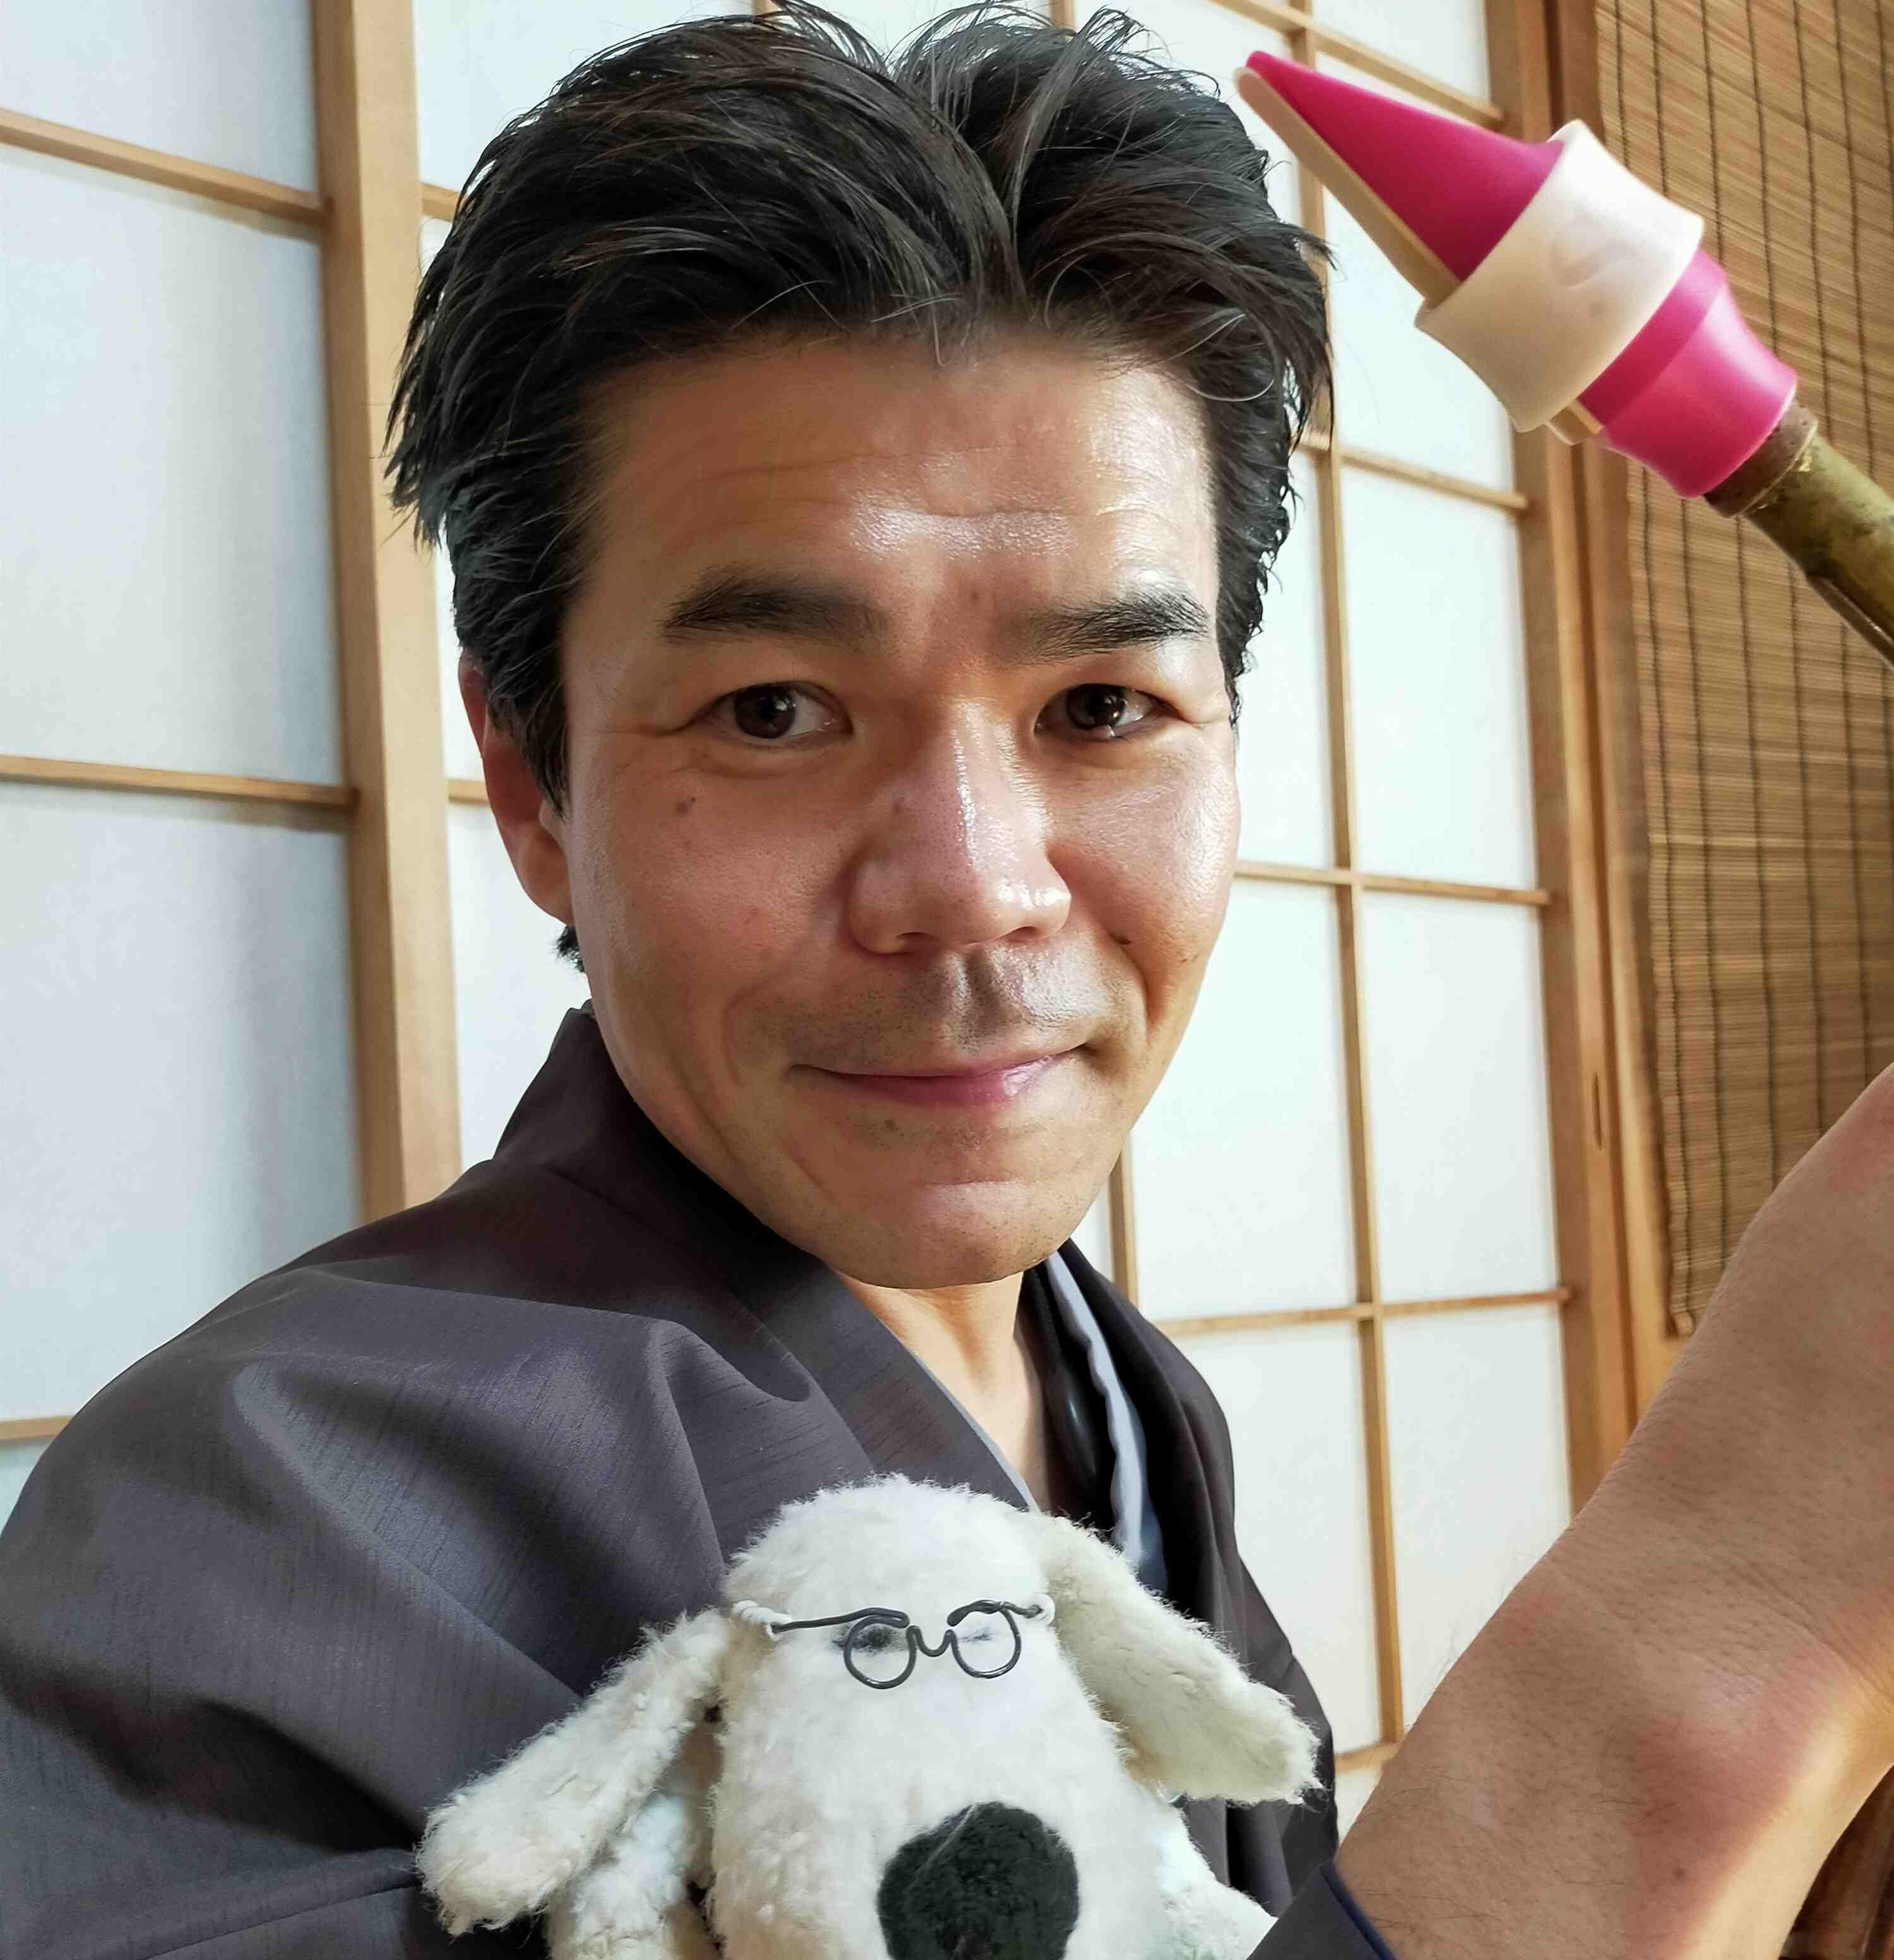 Yosuke Sato plays a Syos saxophone mouthpiece